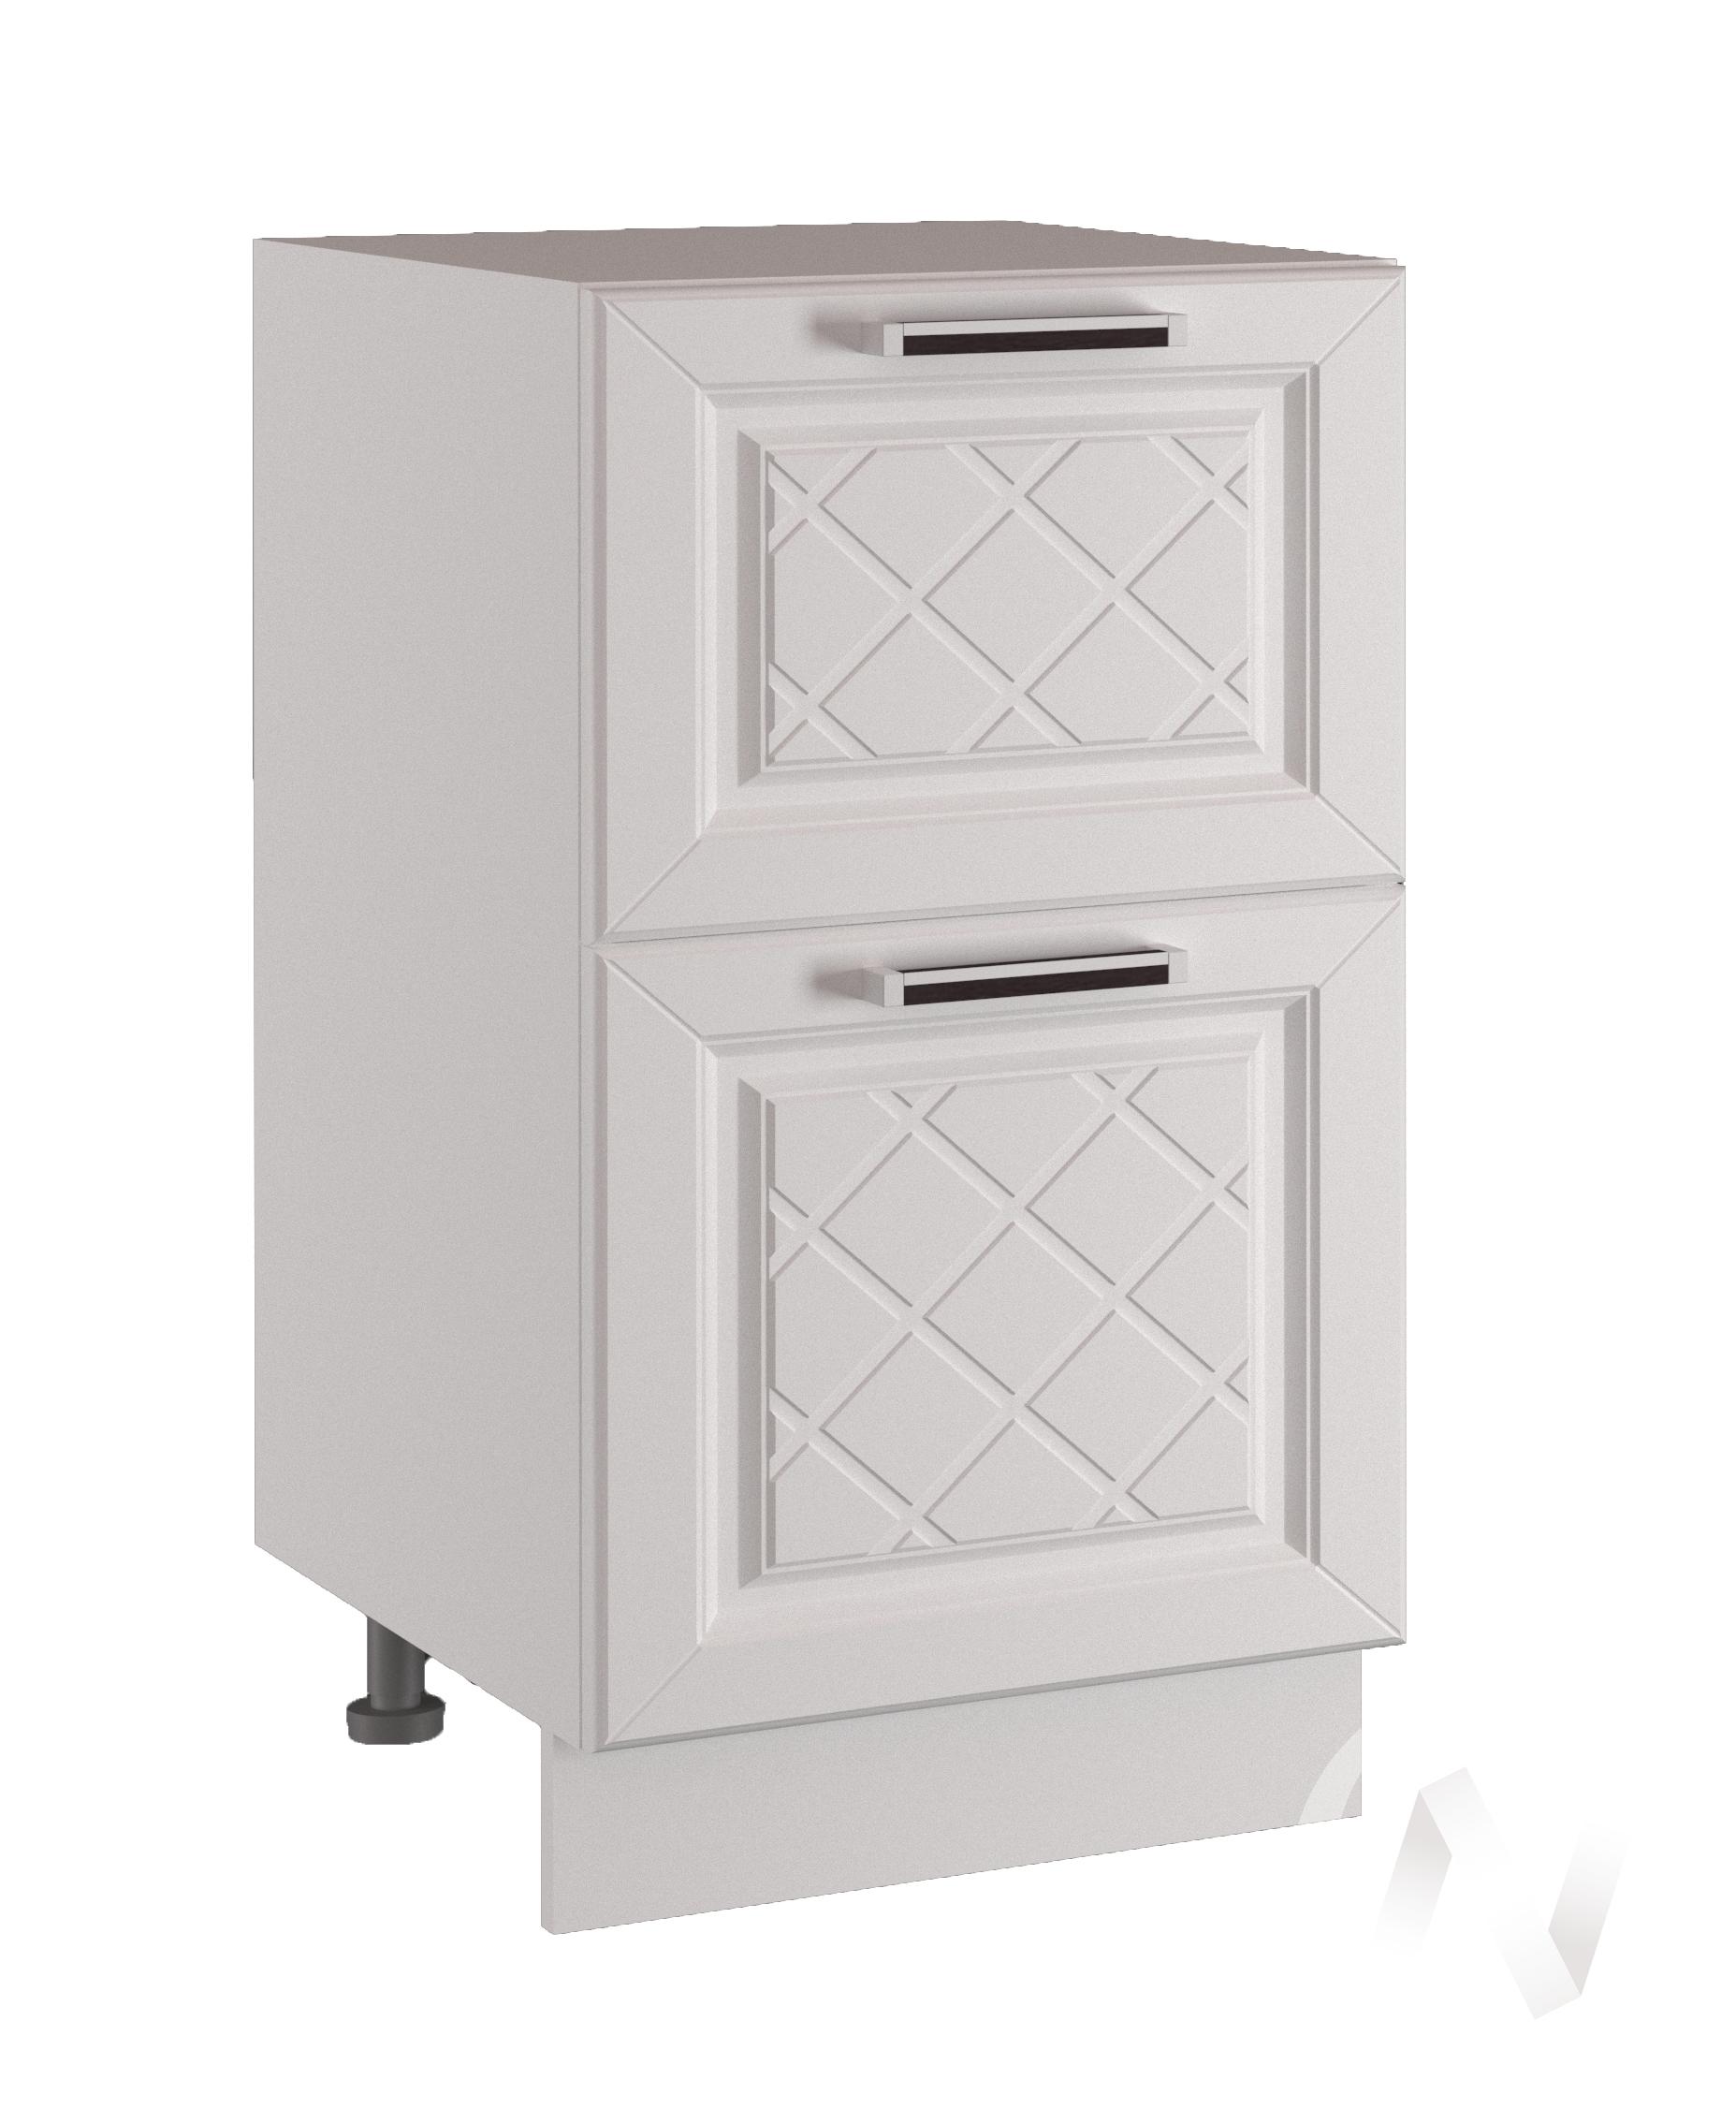 "Кухня ""Вена"": Шкаф нижний с 2-мя ящиками 600, ШН2Я 600 (корпус белый)"